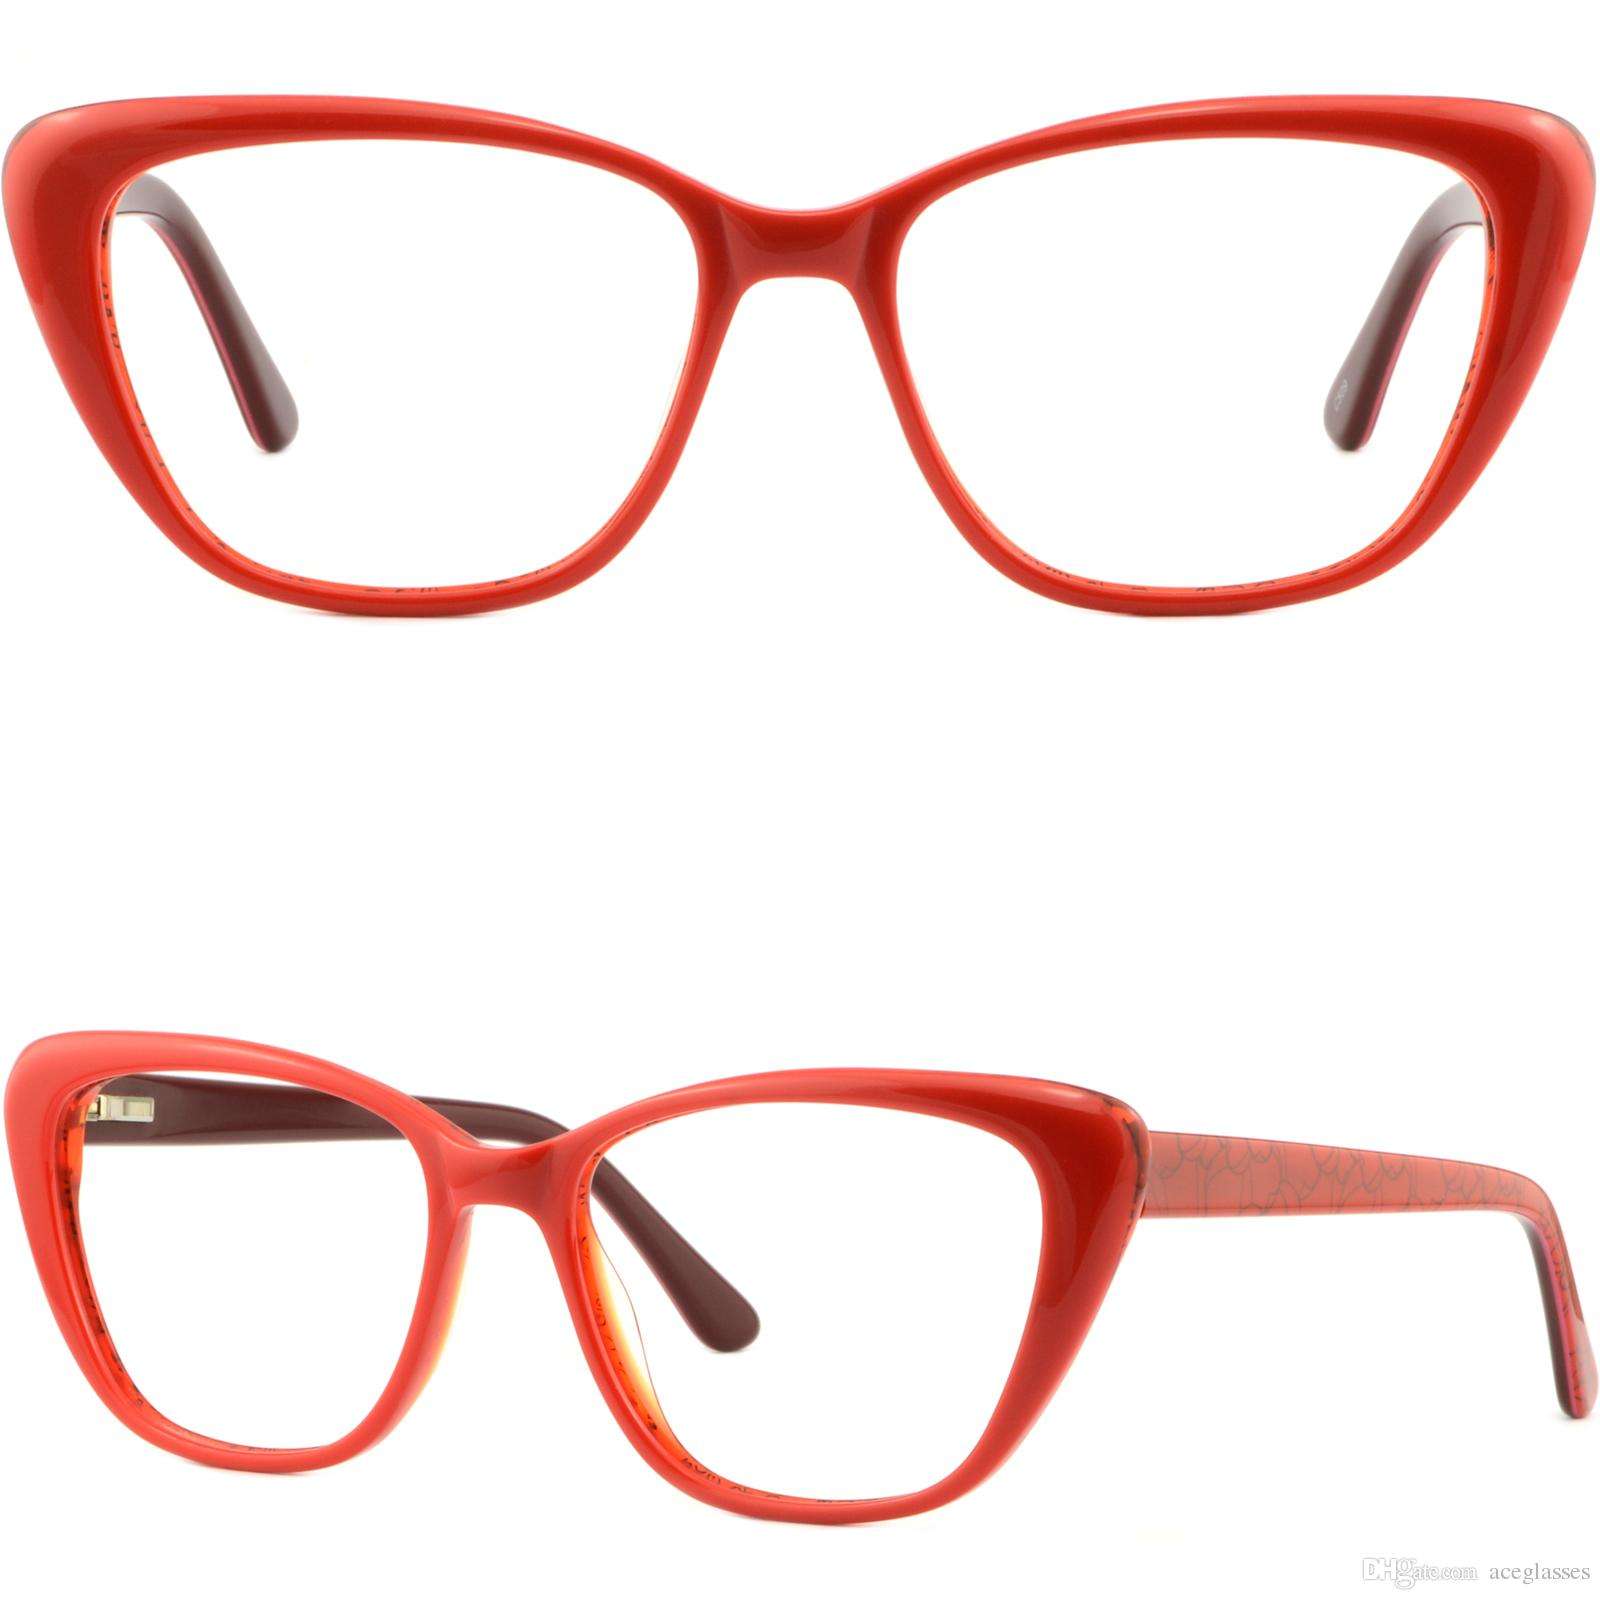 00c55d7401e Large Wide Cateye Women S Frames Plastic Spring Hinges Prescription Glasses  Red Eyeglass Frame Displays Eyeglass Frame Materials From Aceglasses